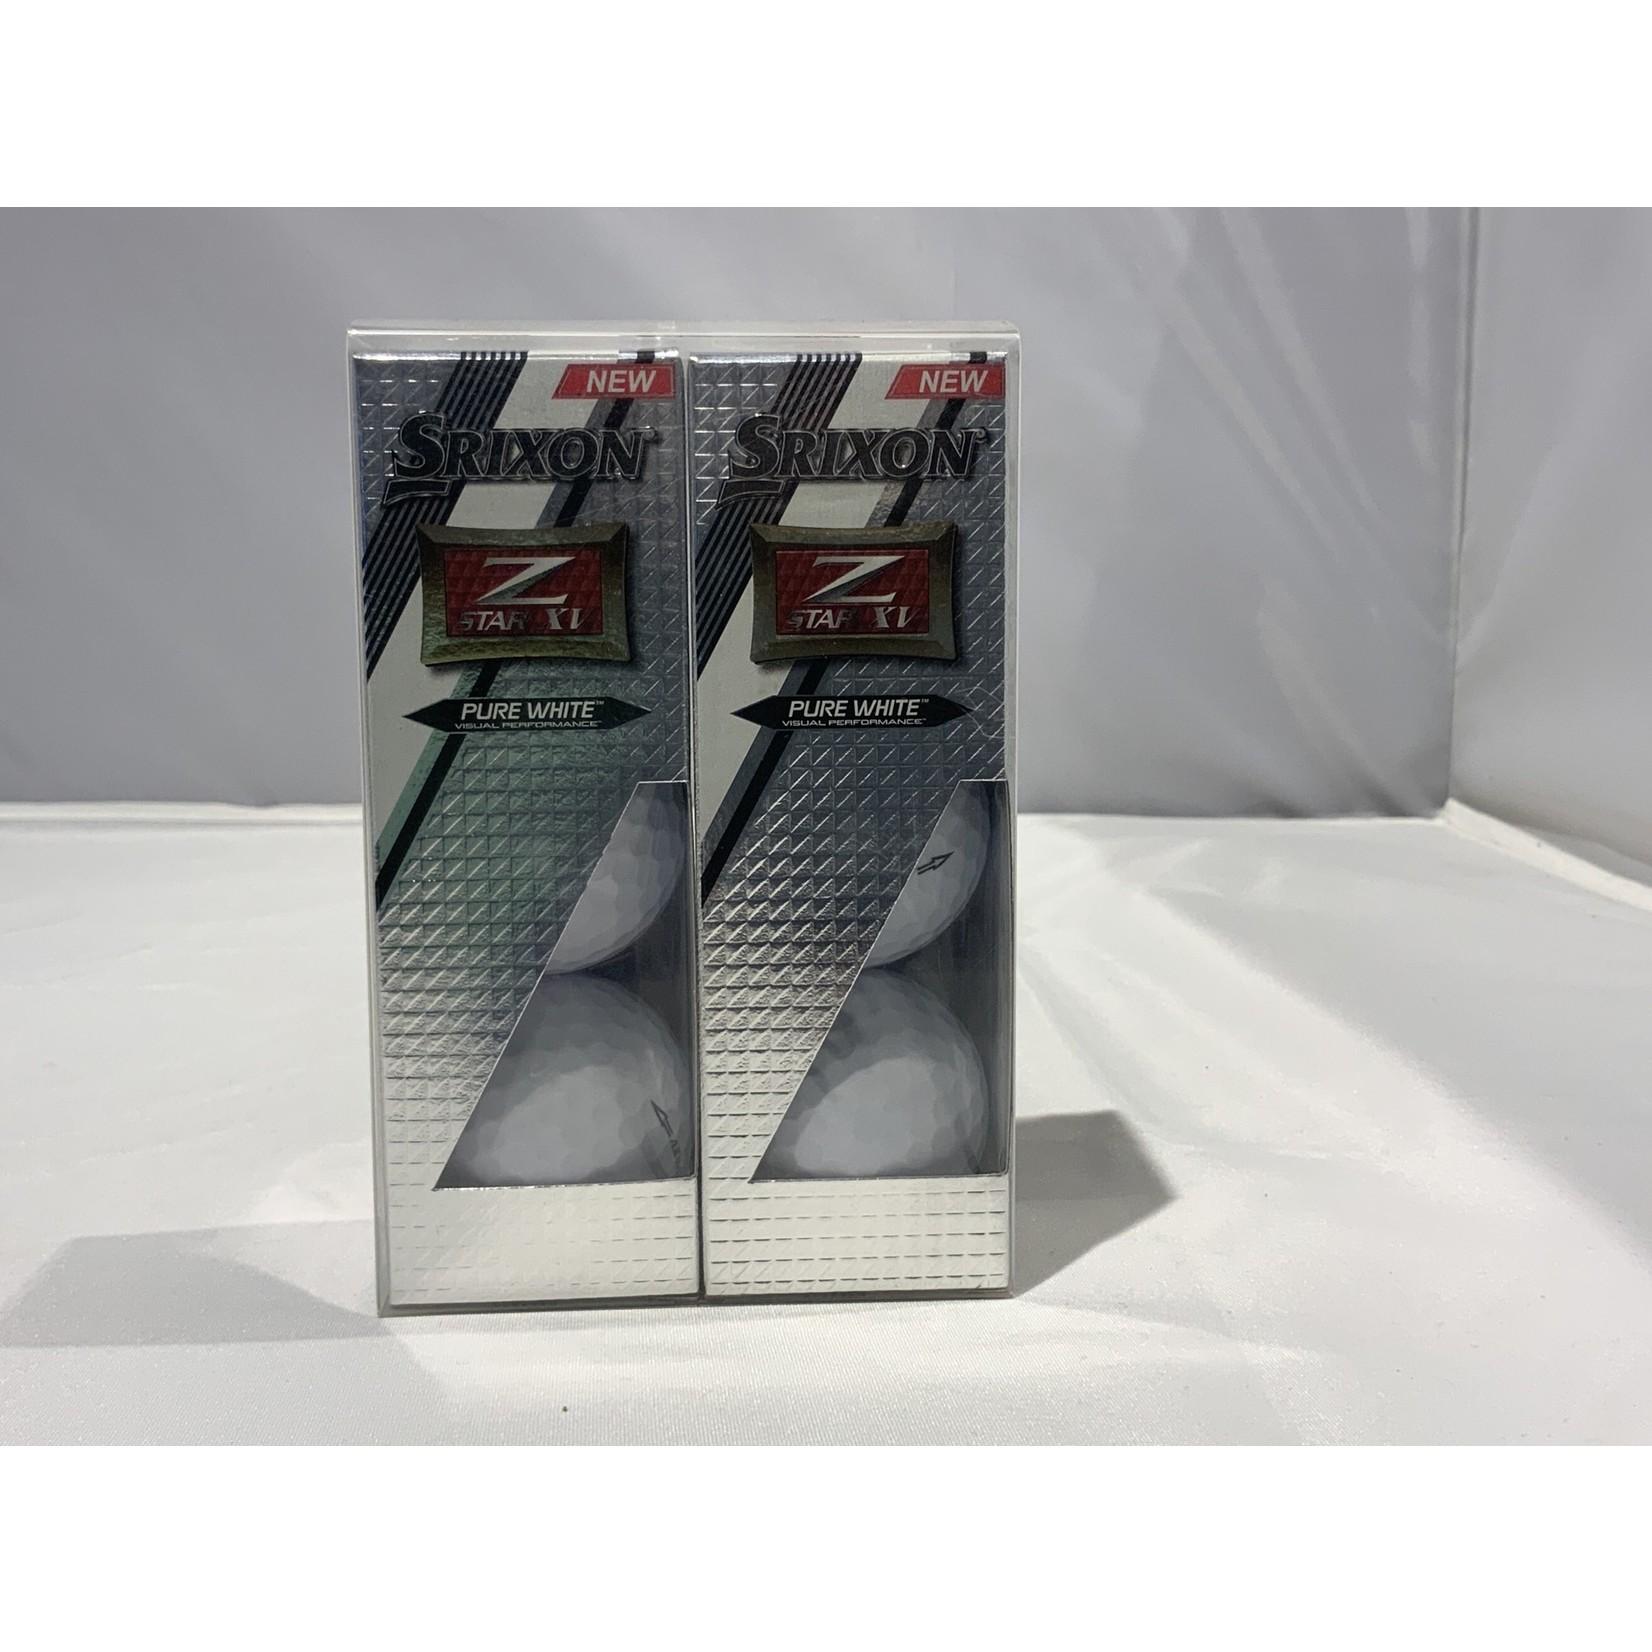 Srixon Srixon 6 pack Z-star XV